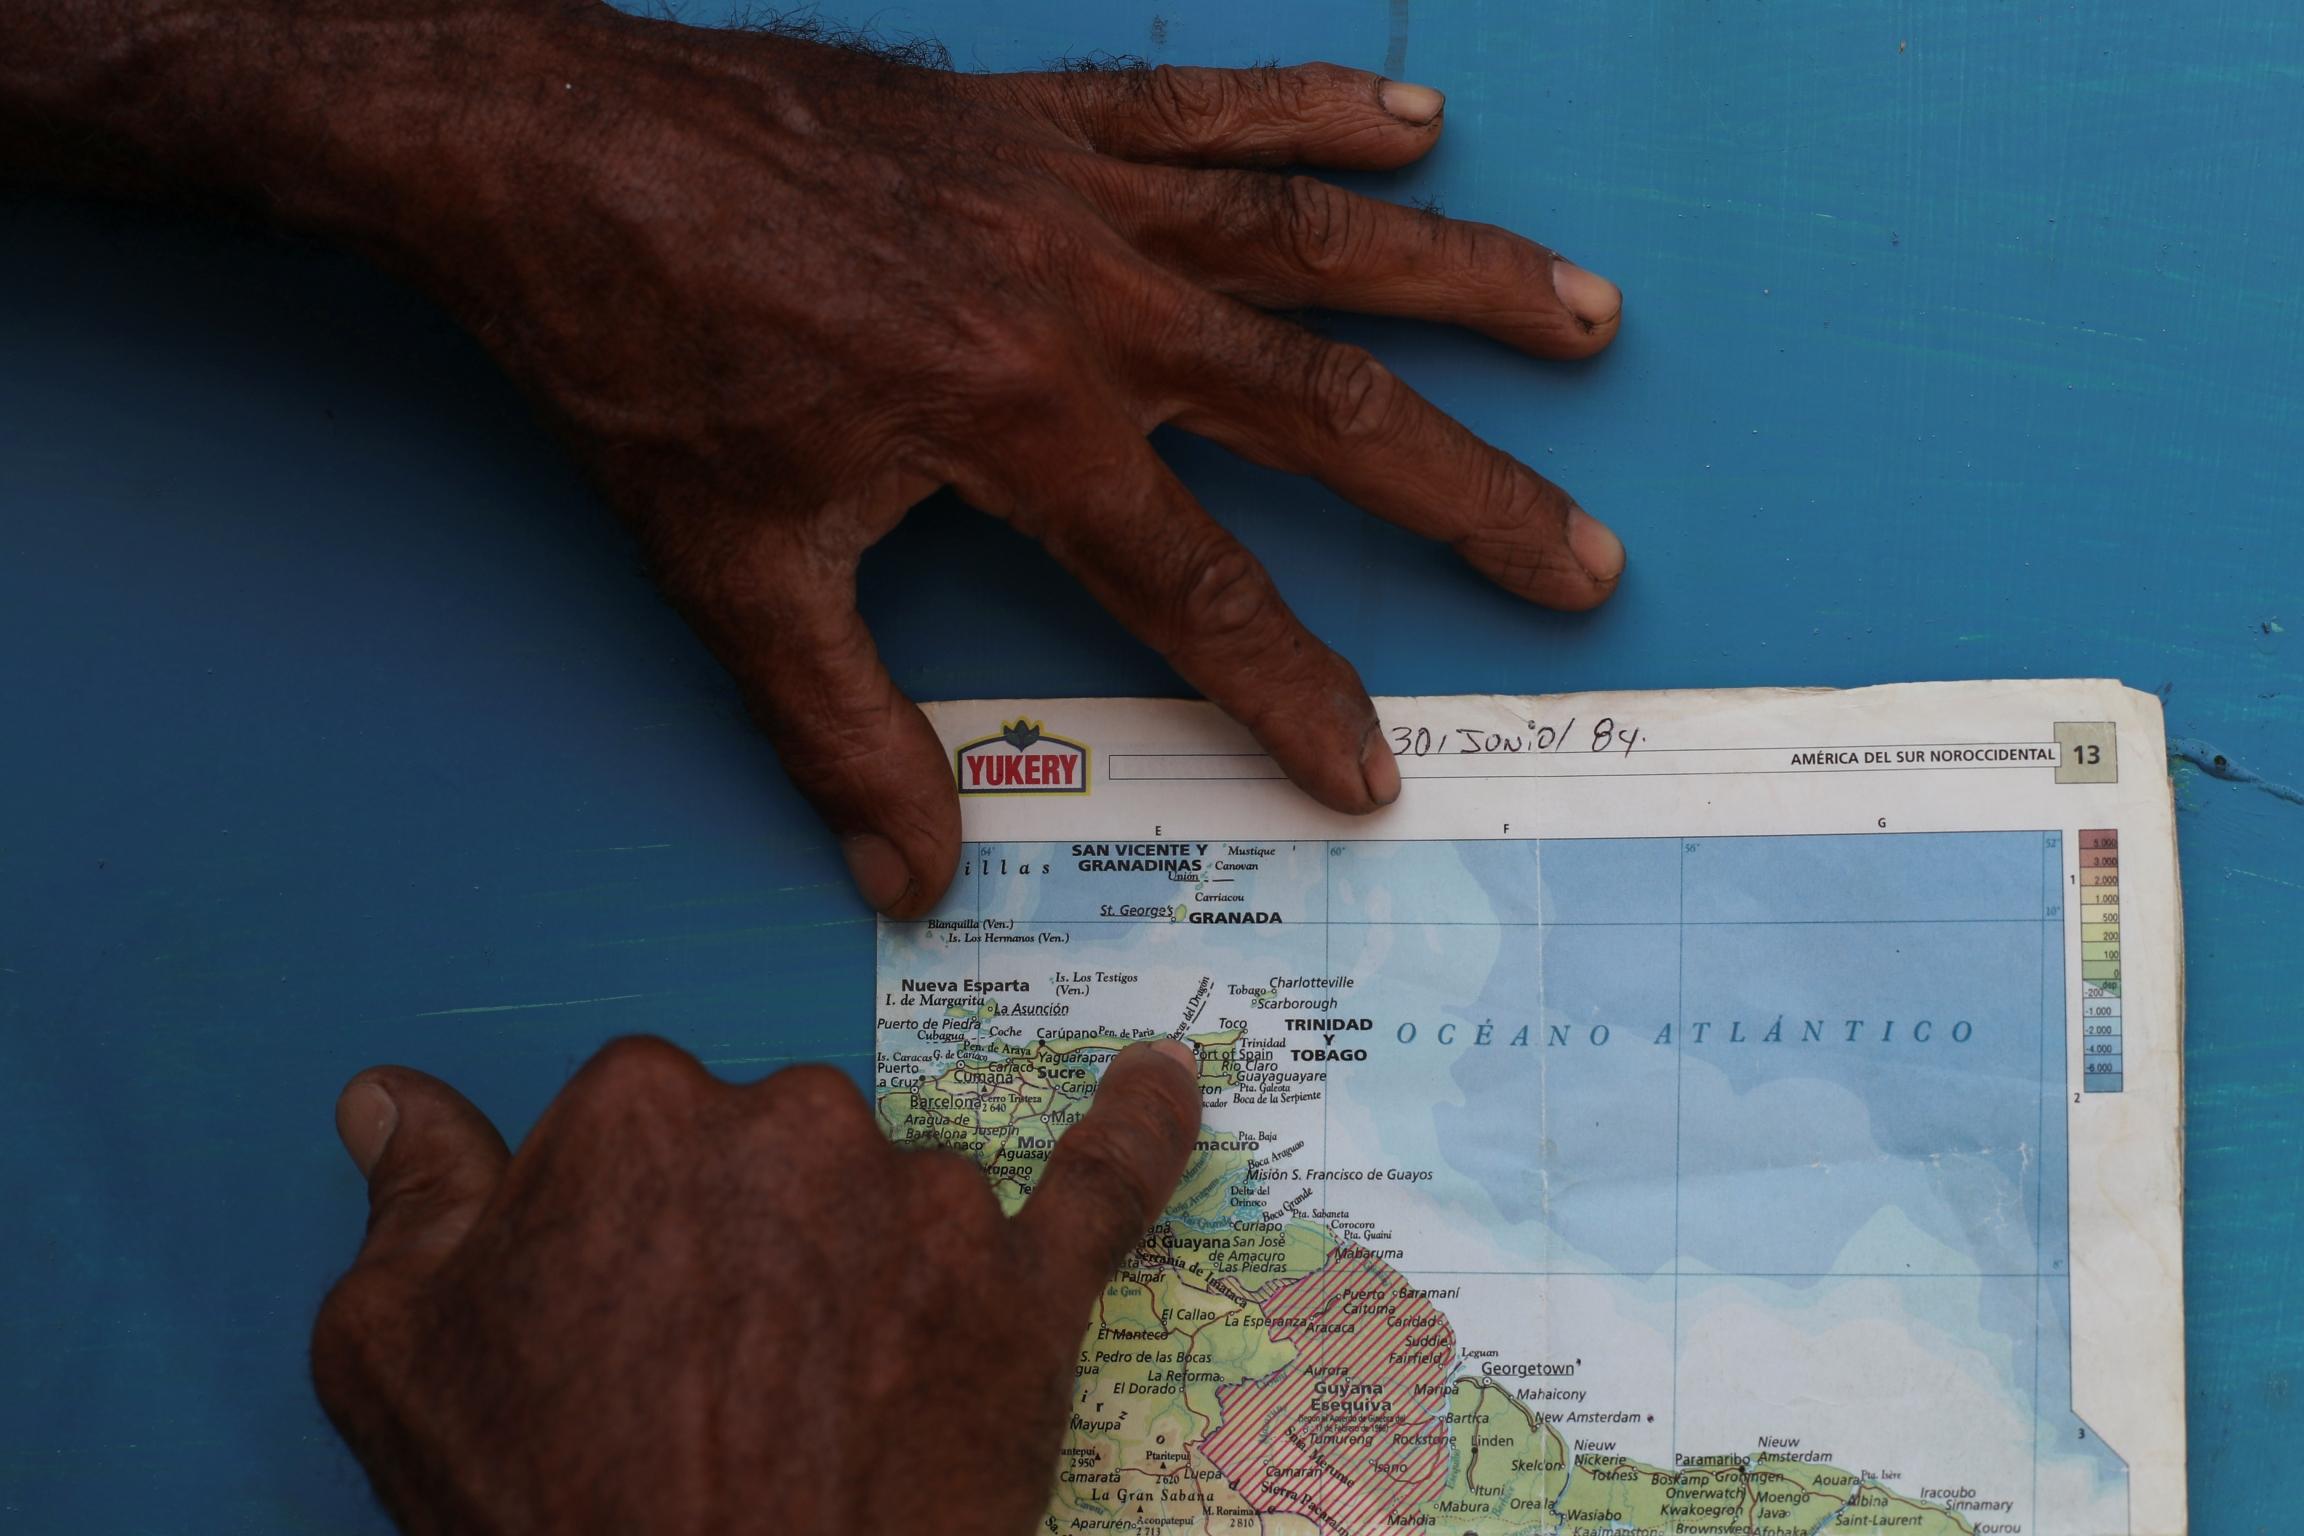 a man points out a dangerous sea passage on a map